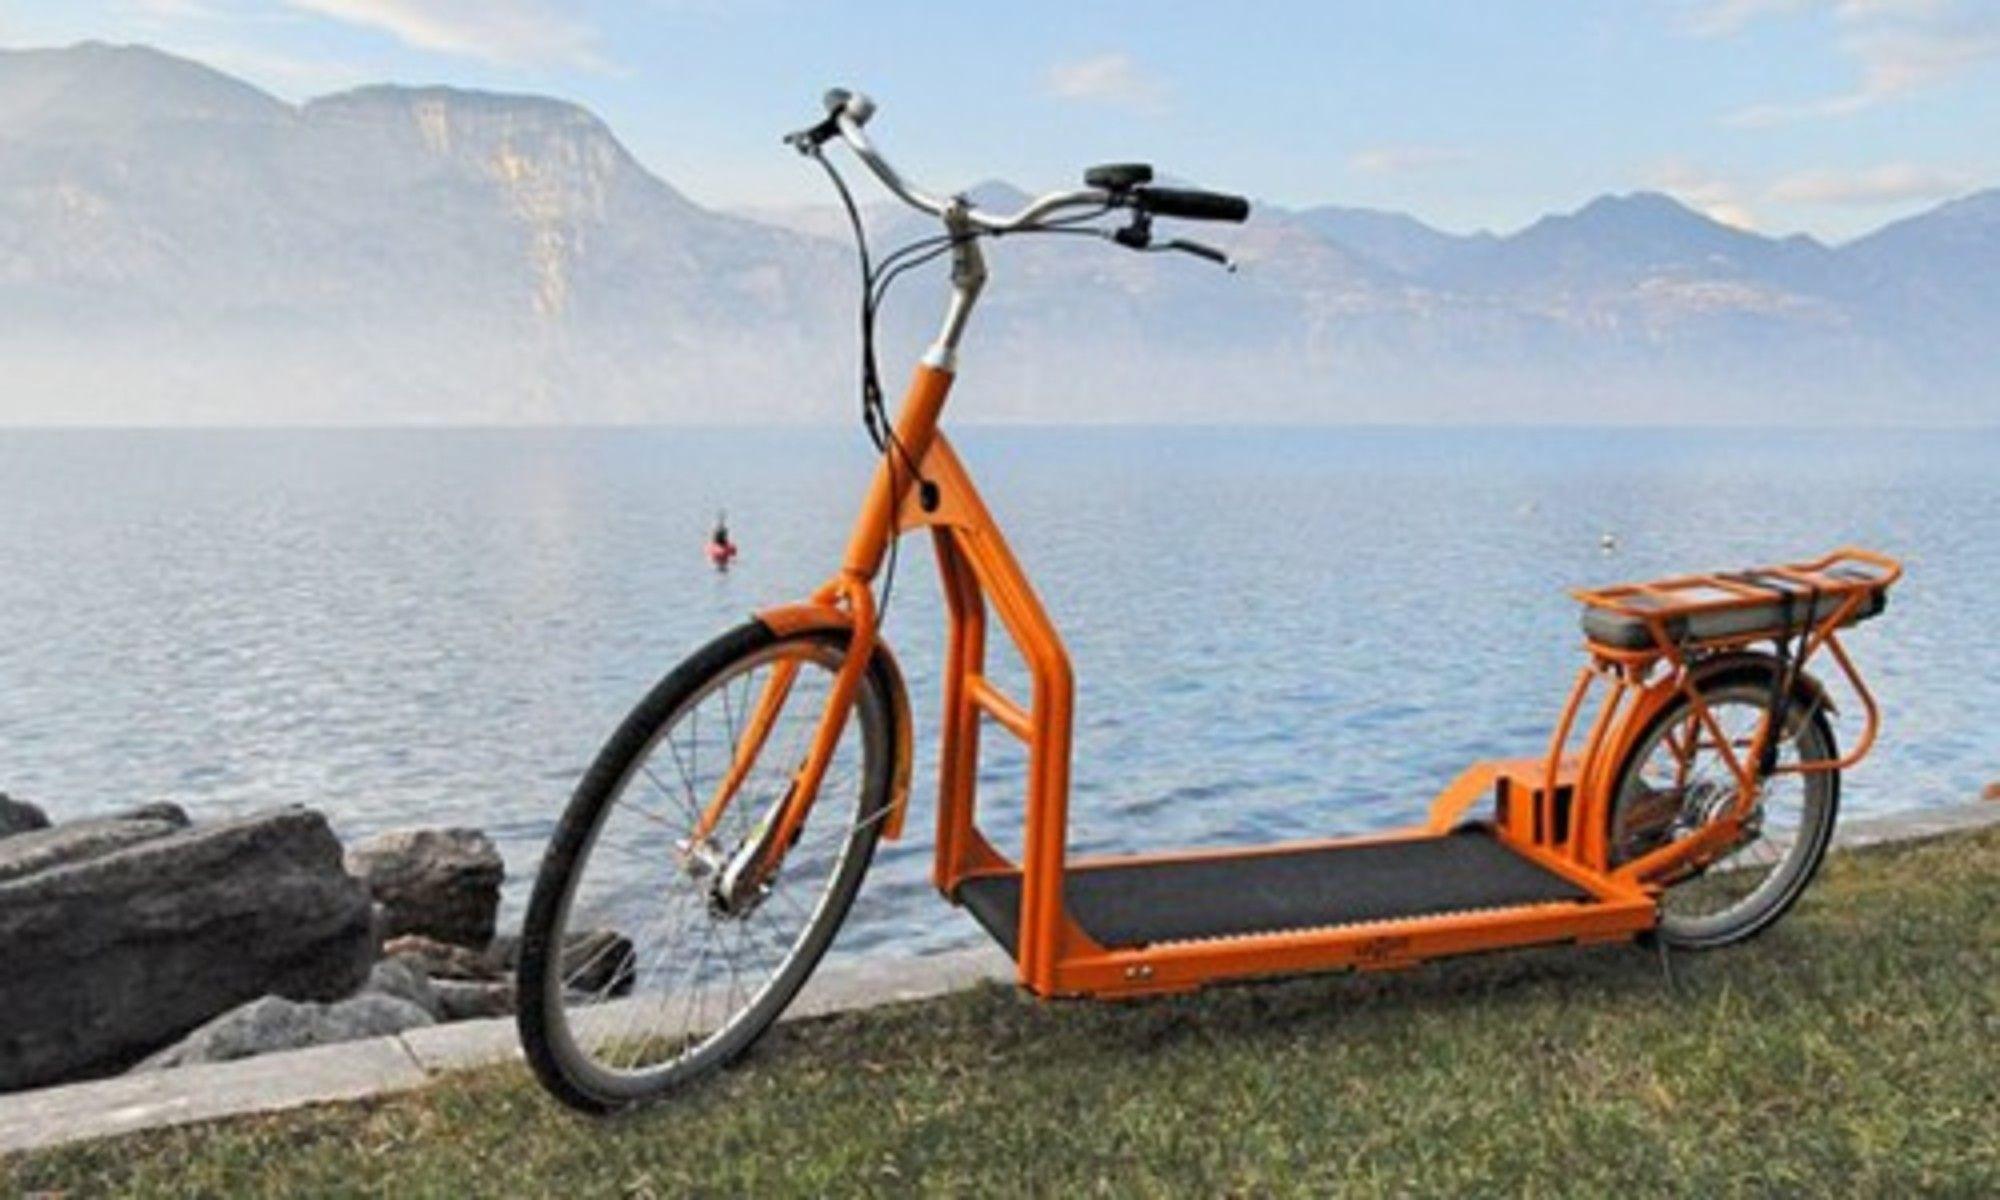 Treadmill Bike On The Price Is Right Bike Treadmill Stationary